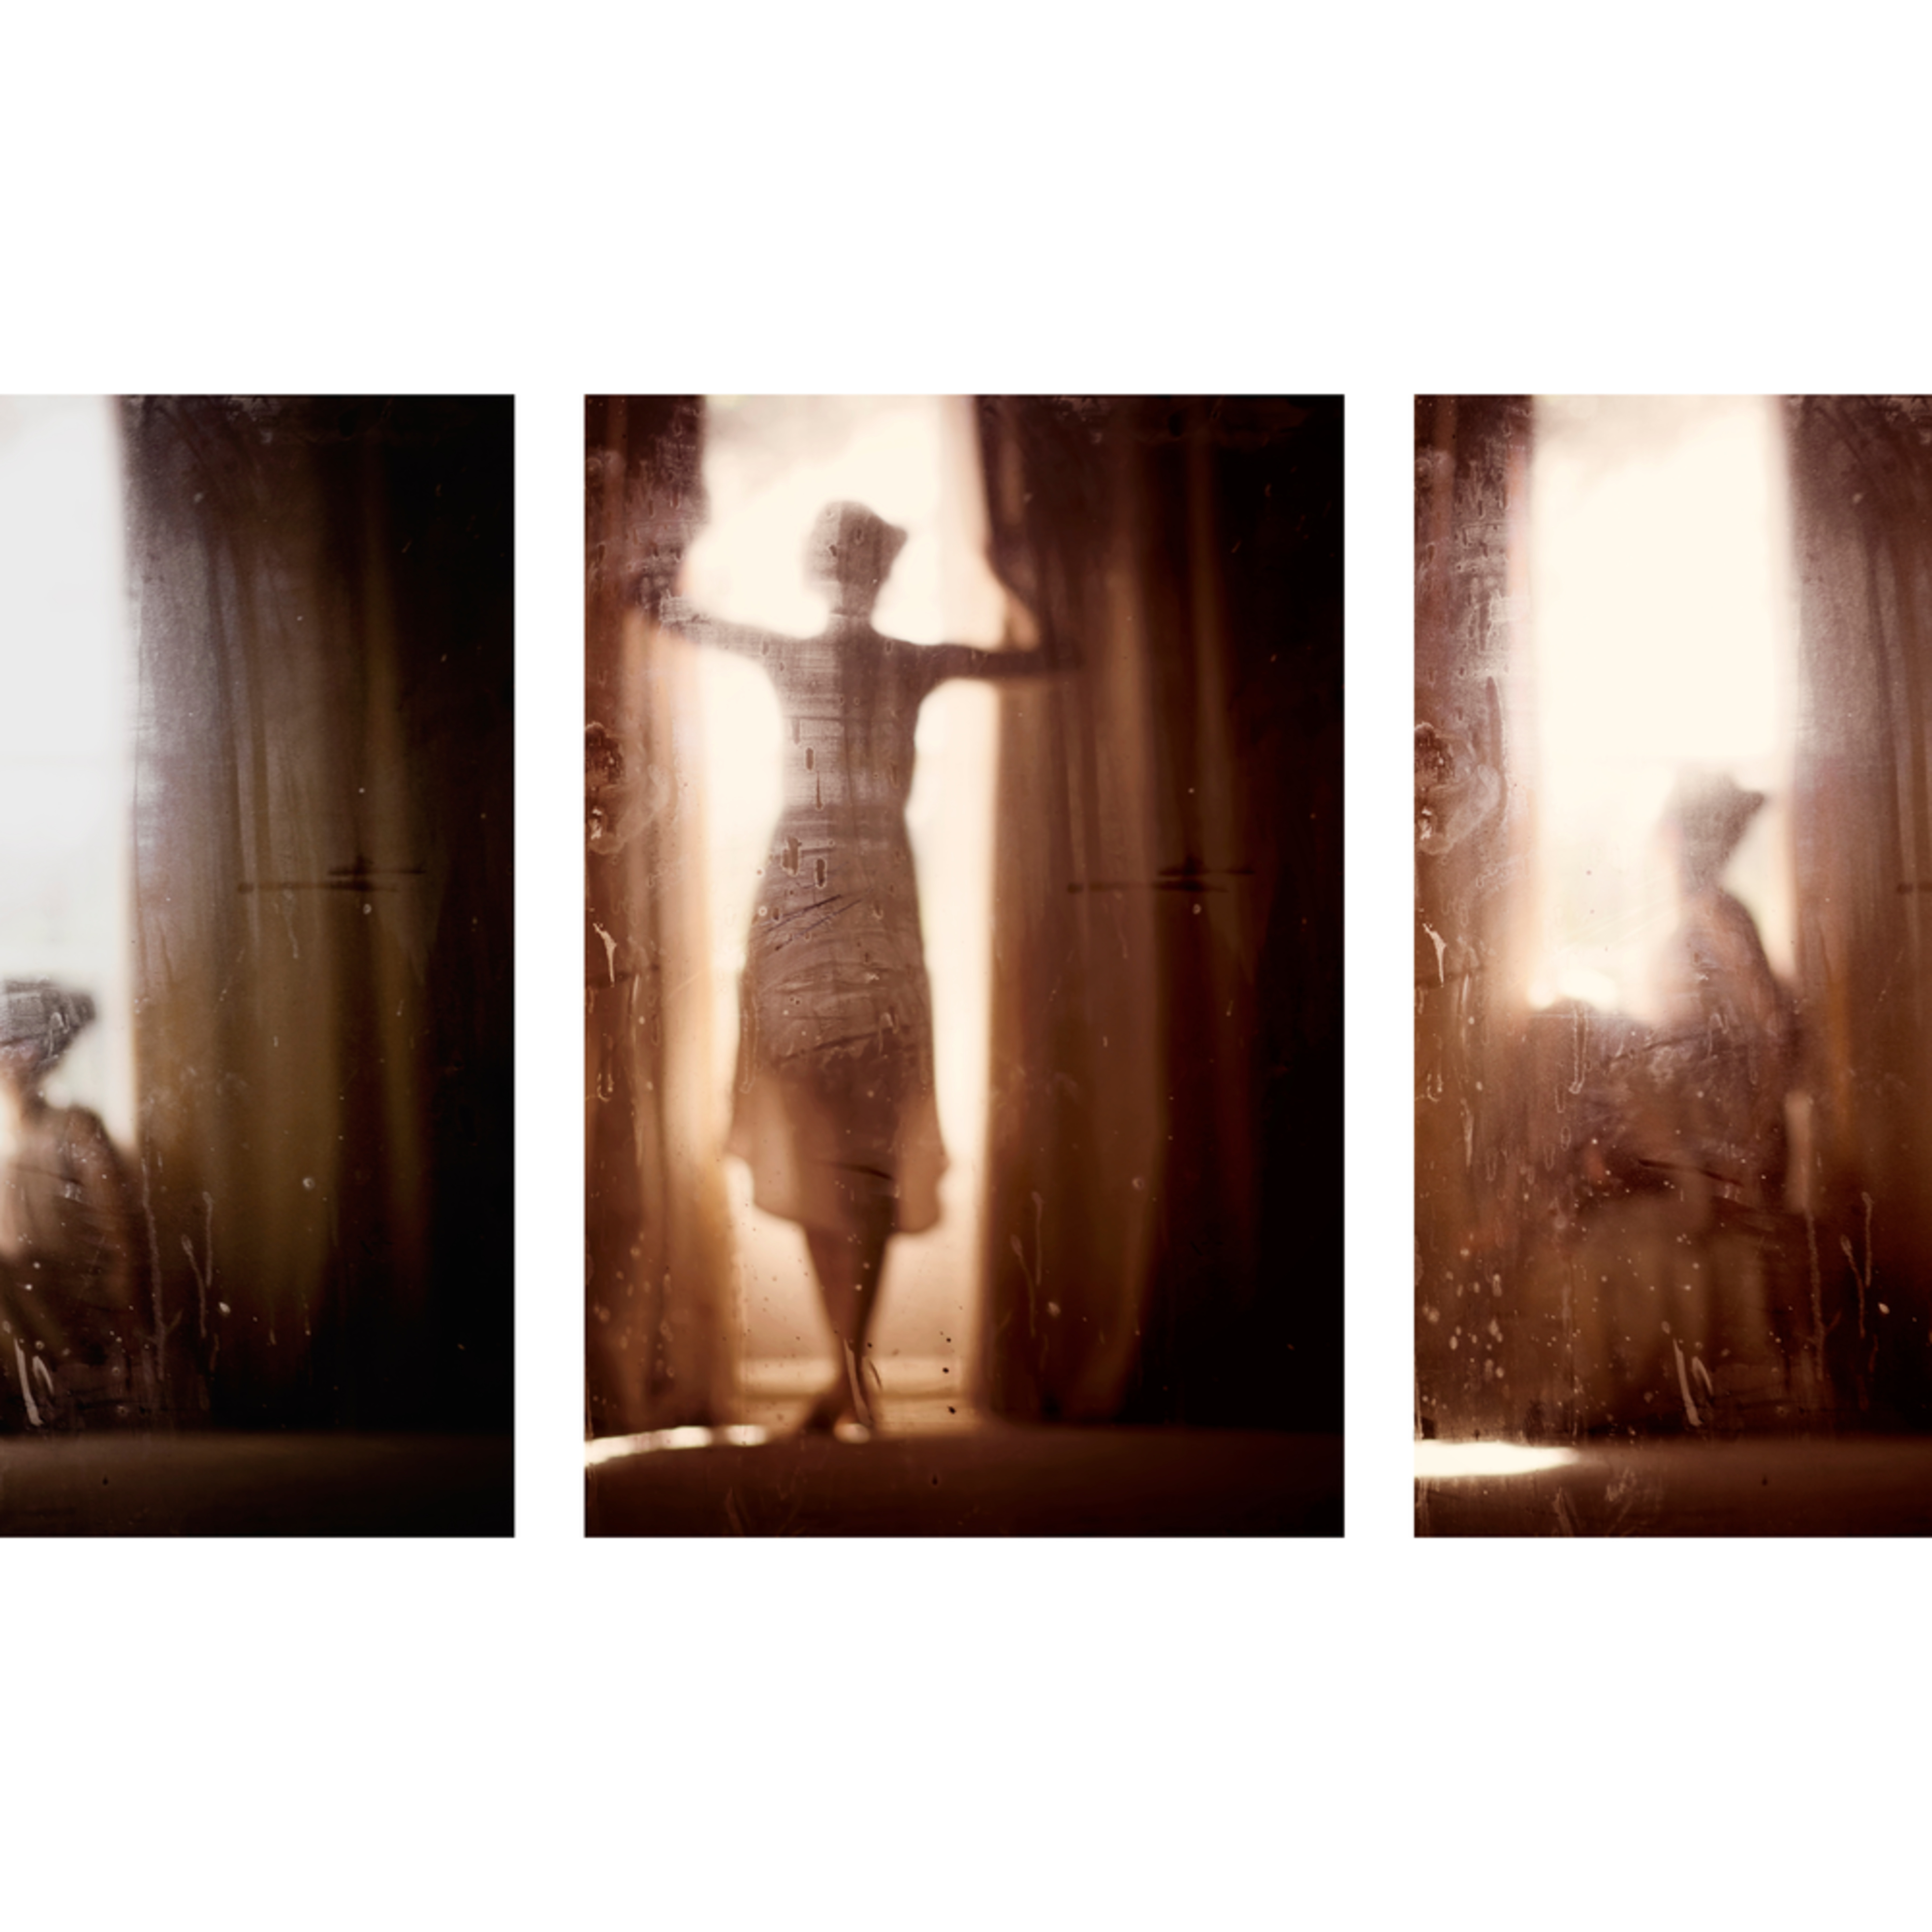 Pride triptych abstract portrait photography fine art print silvia nikolov uojoi5